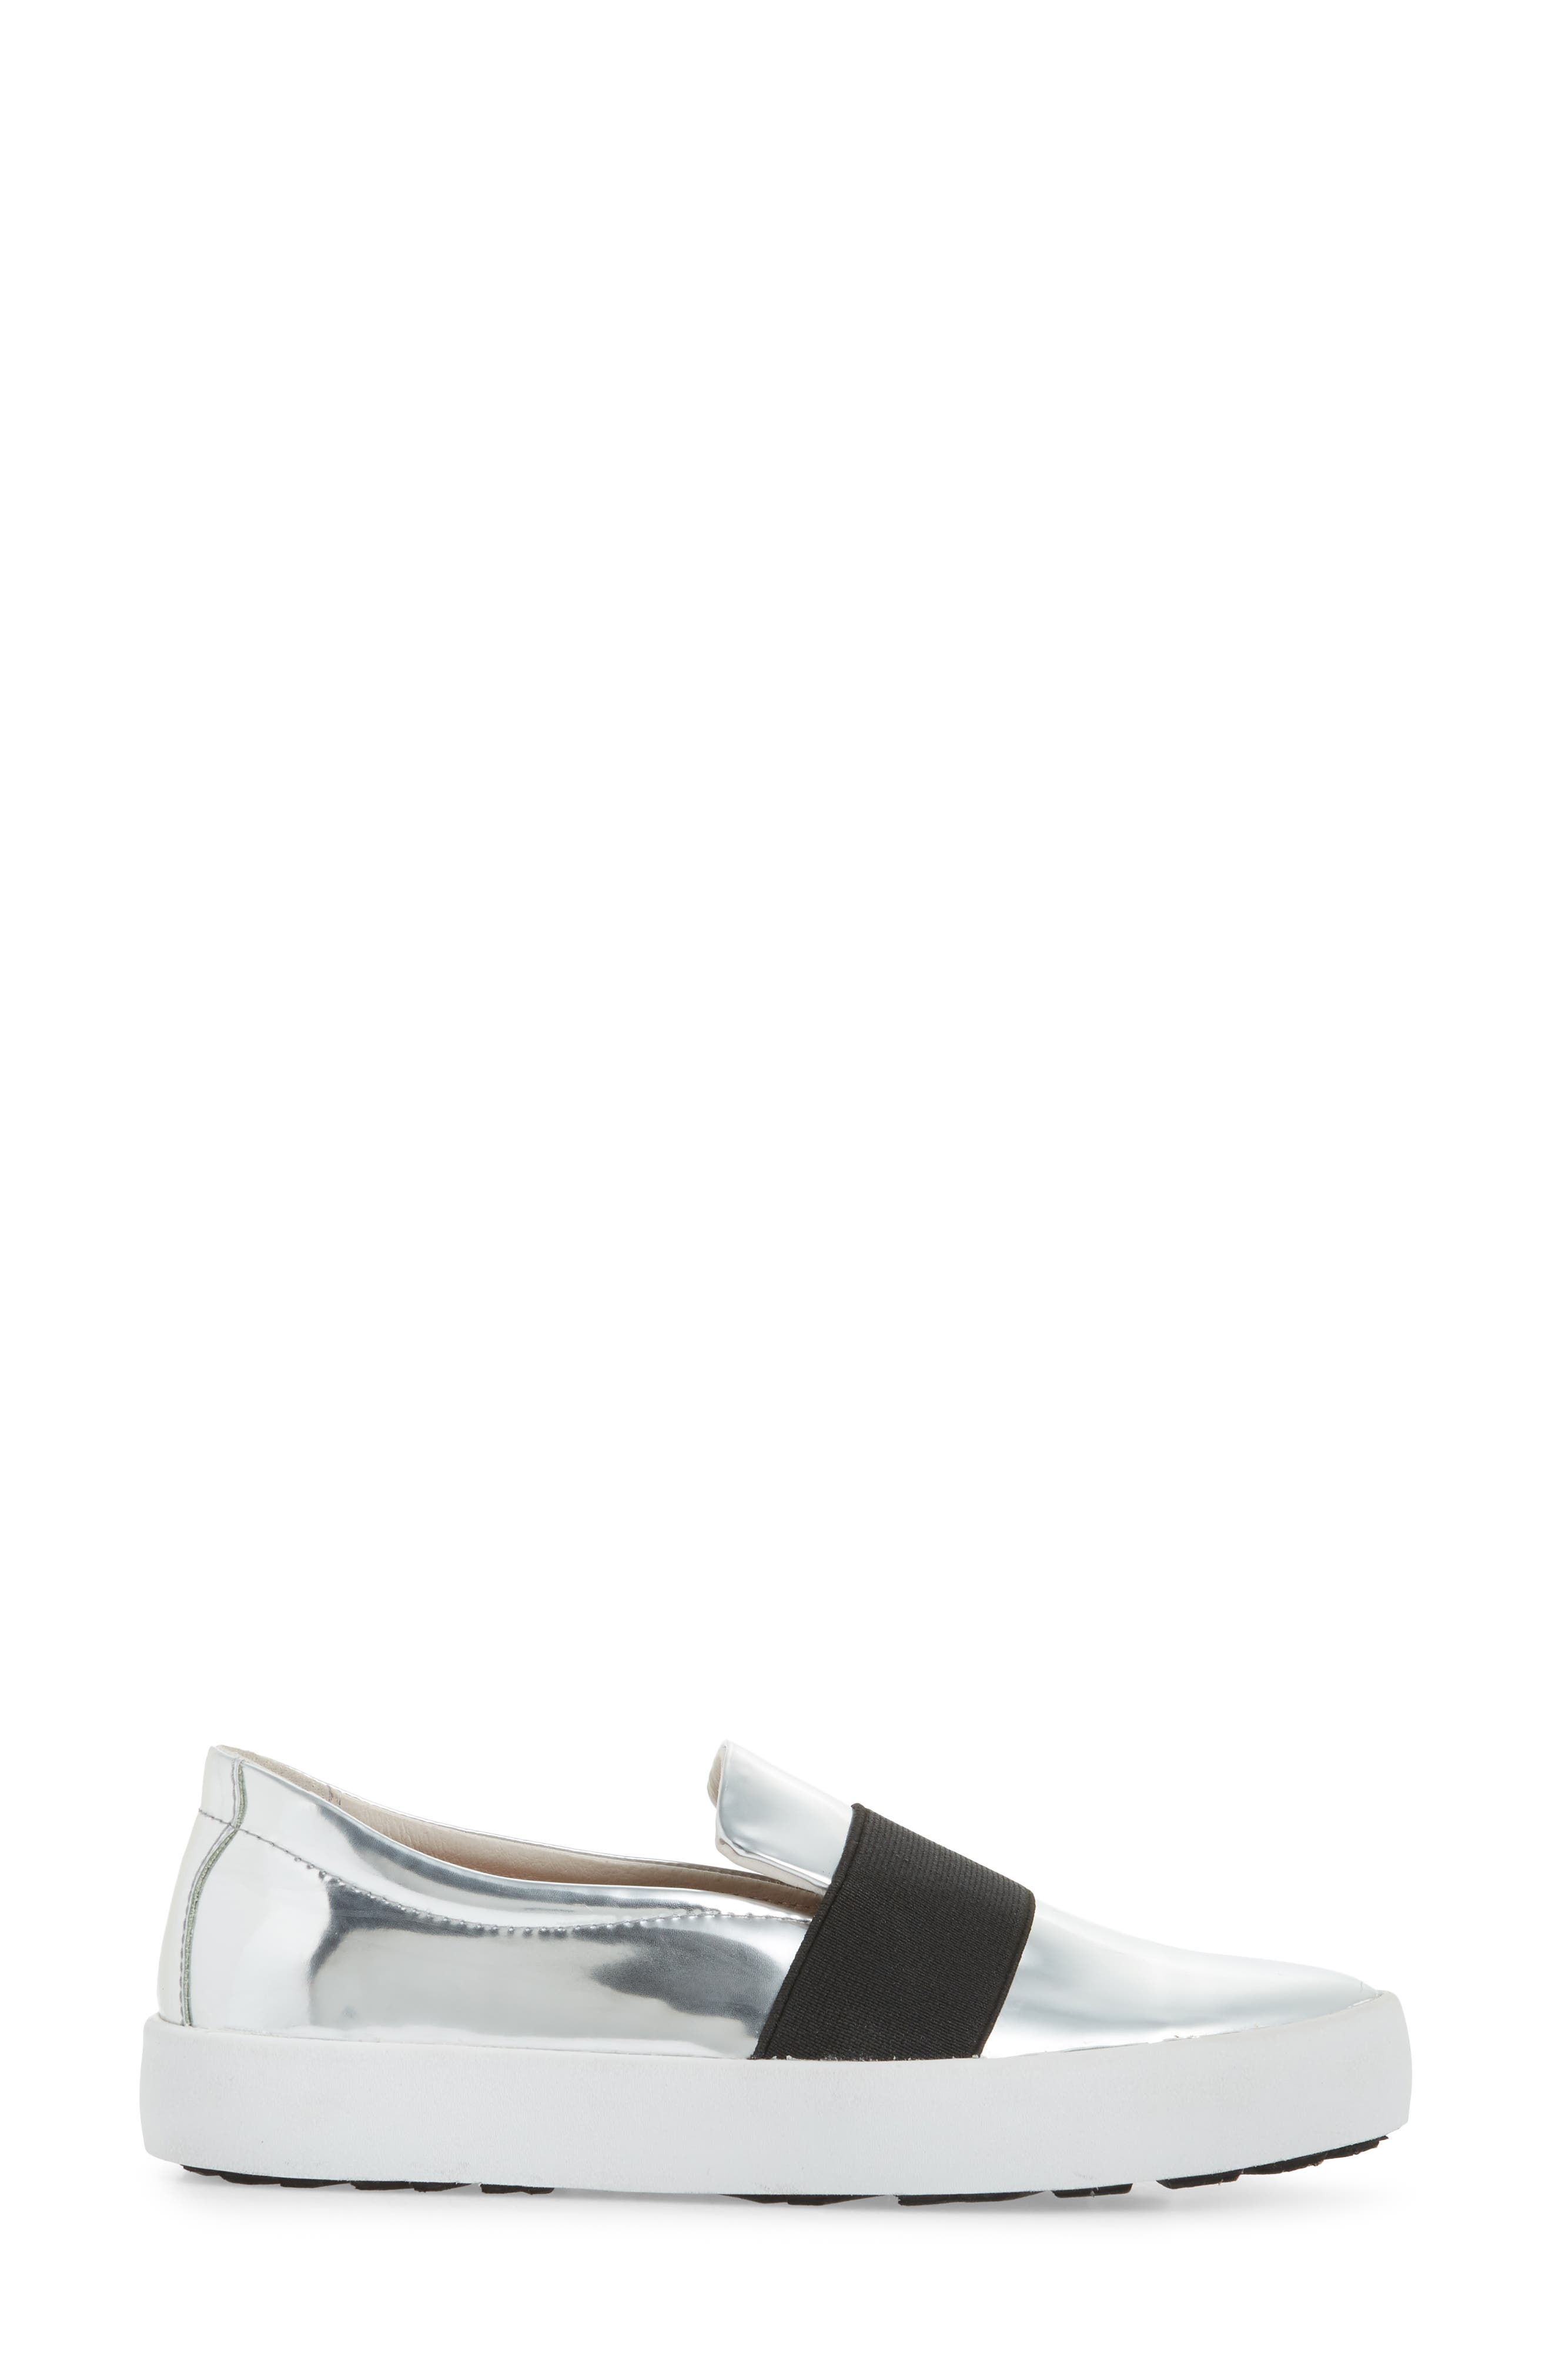 PL99 Slip-On Sneaker,                             Alternate thumbnail 3, color,                             Silver Leather